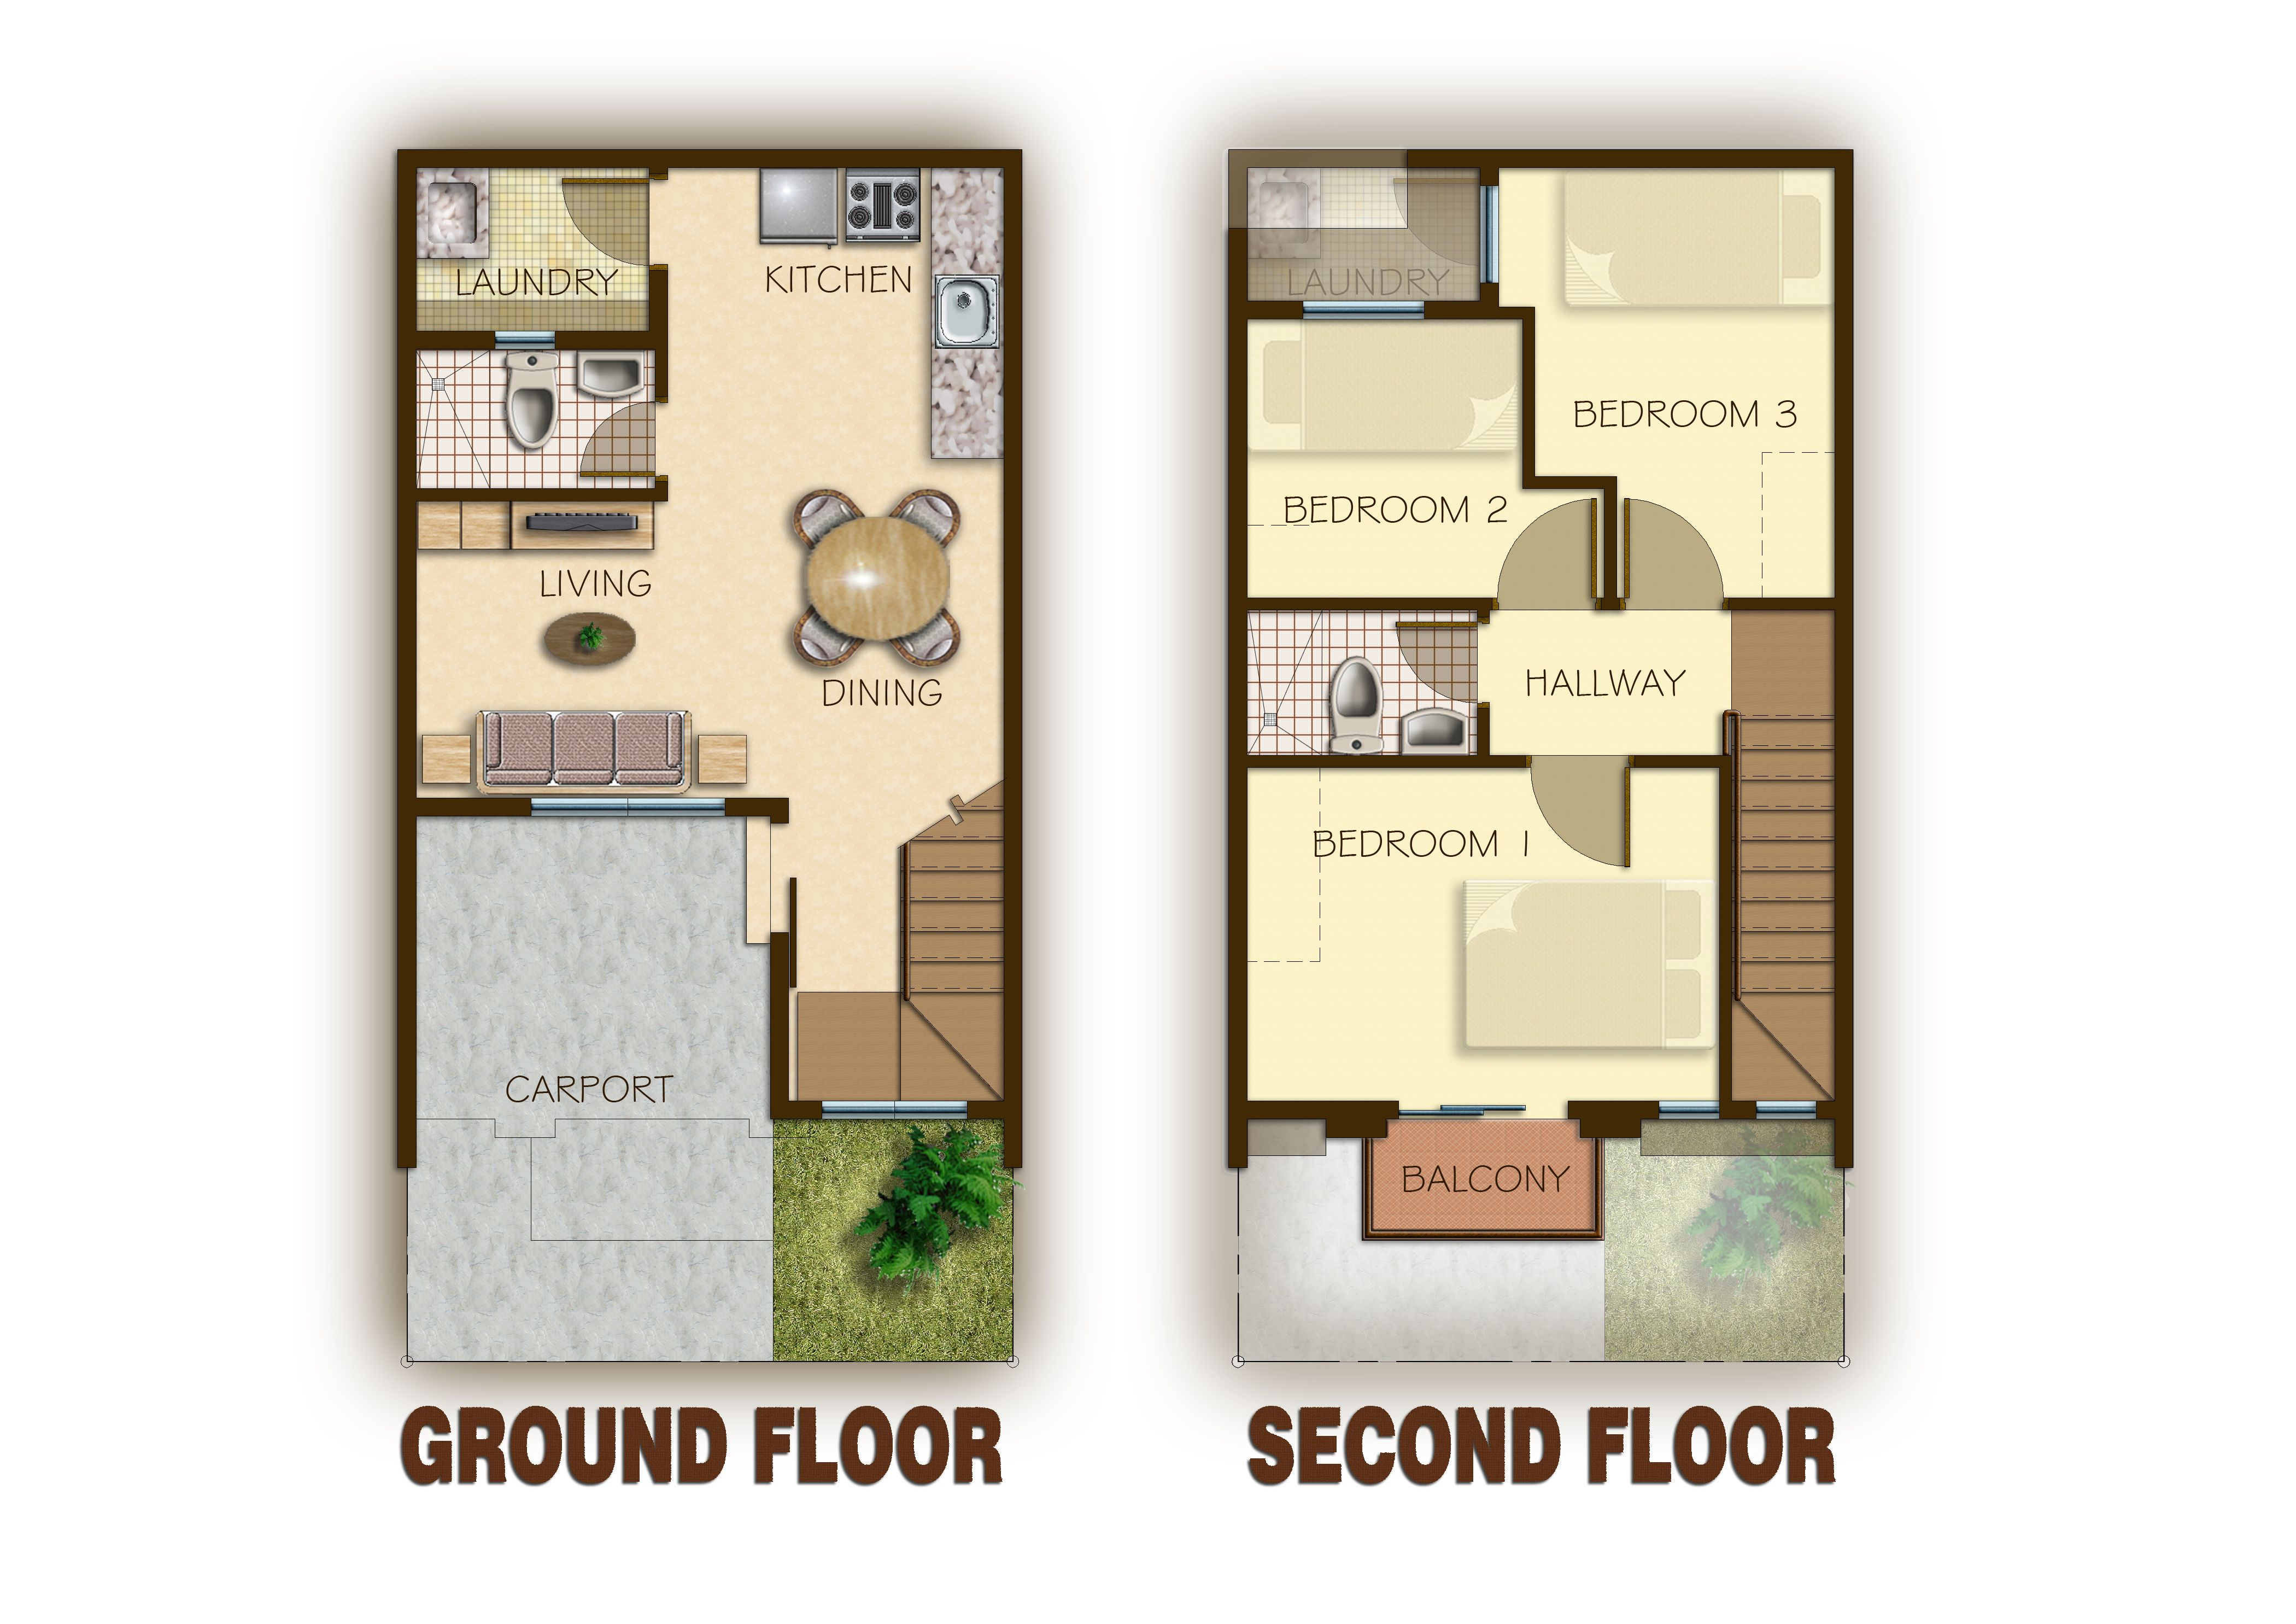 Floor Plan Villa Dulalia Fatima Plans 2 Storey House Design Two Story House Design House Plans